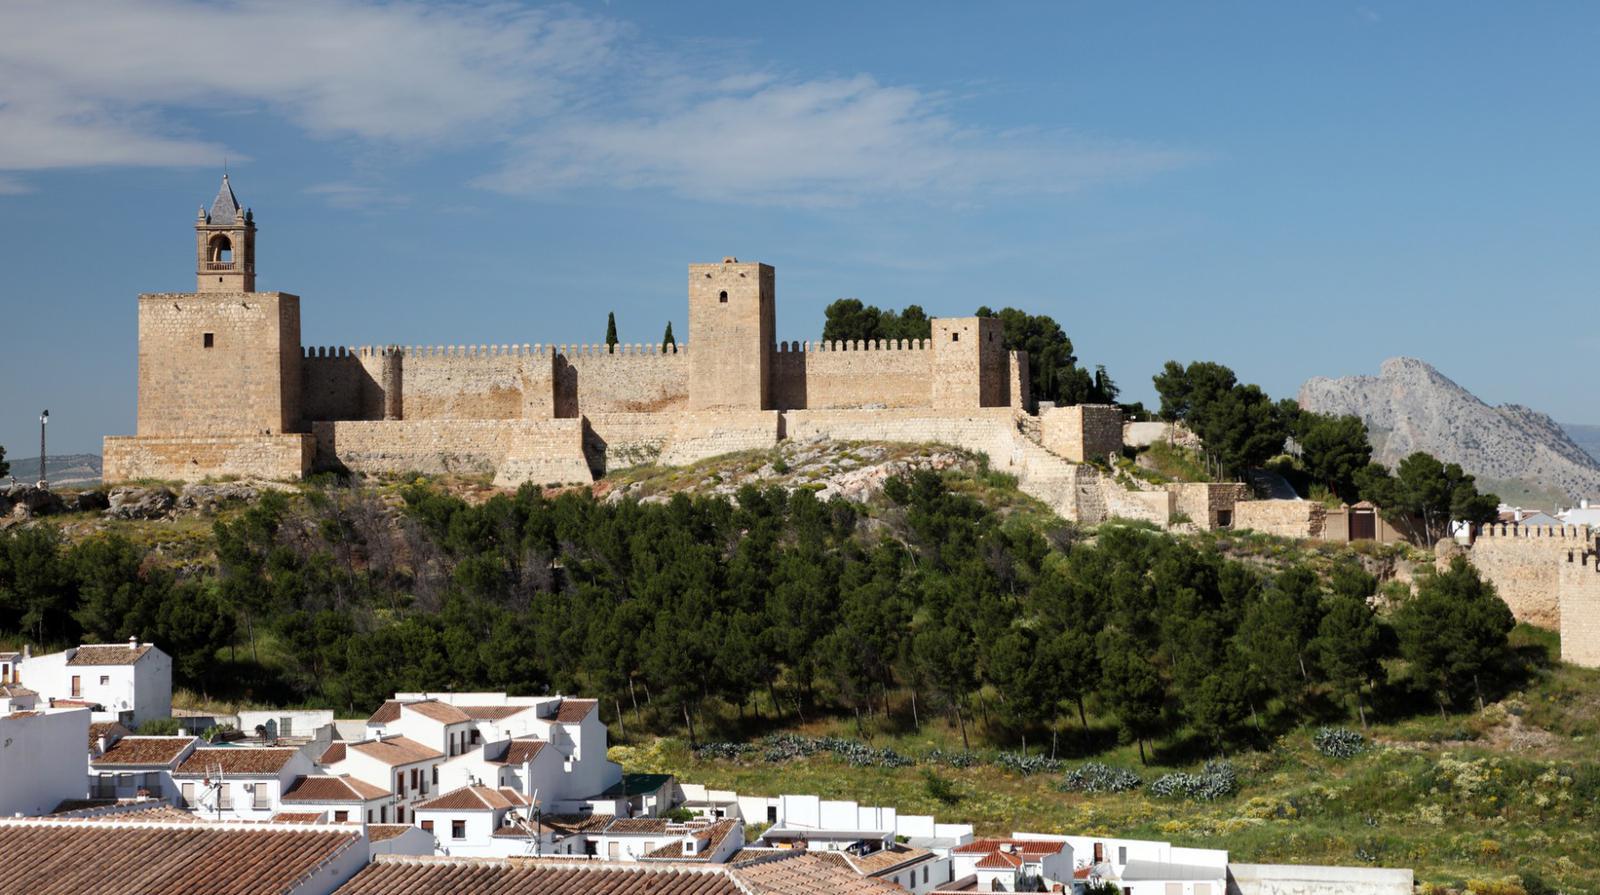 pueblos andaluces con encanto Moorish castle Alcazaba in Andalusian town Antequera, Spain